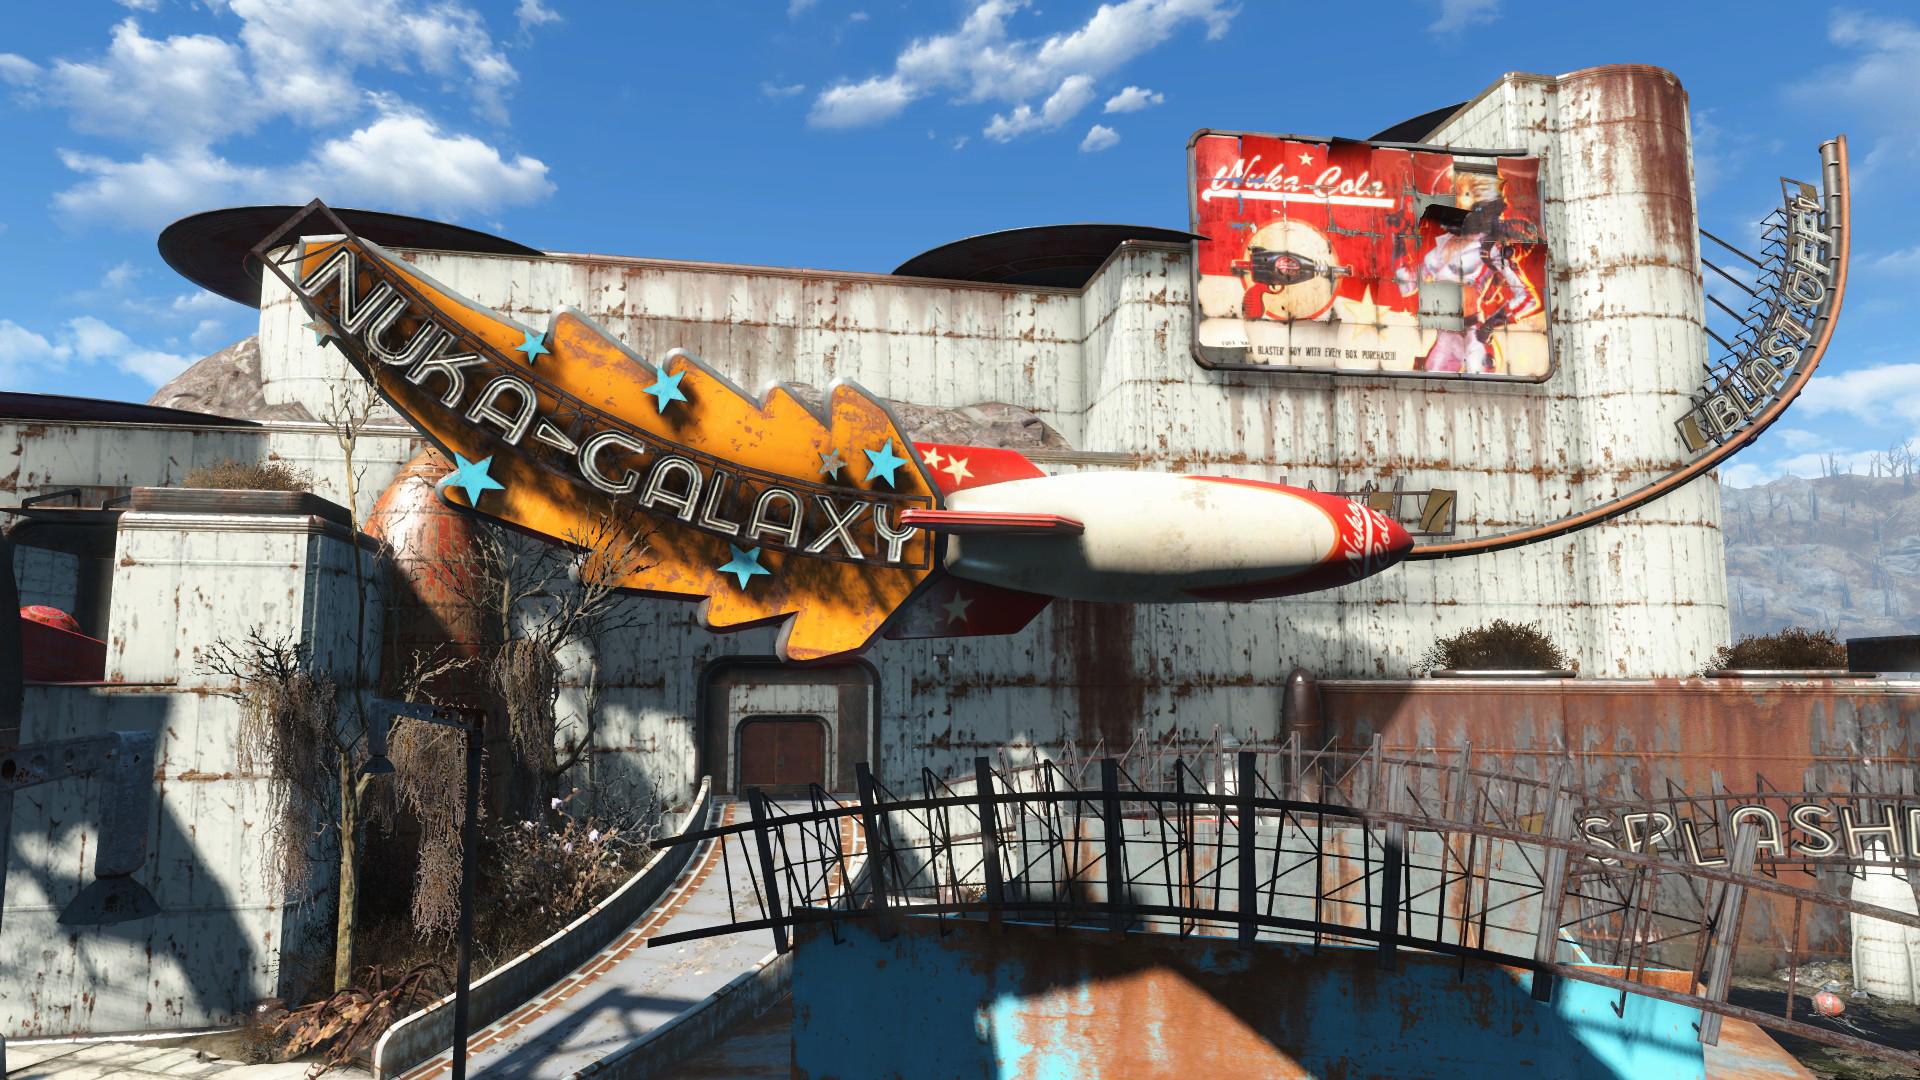 Nuka-Galaxy Ride